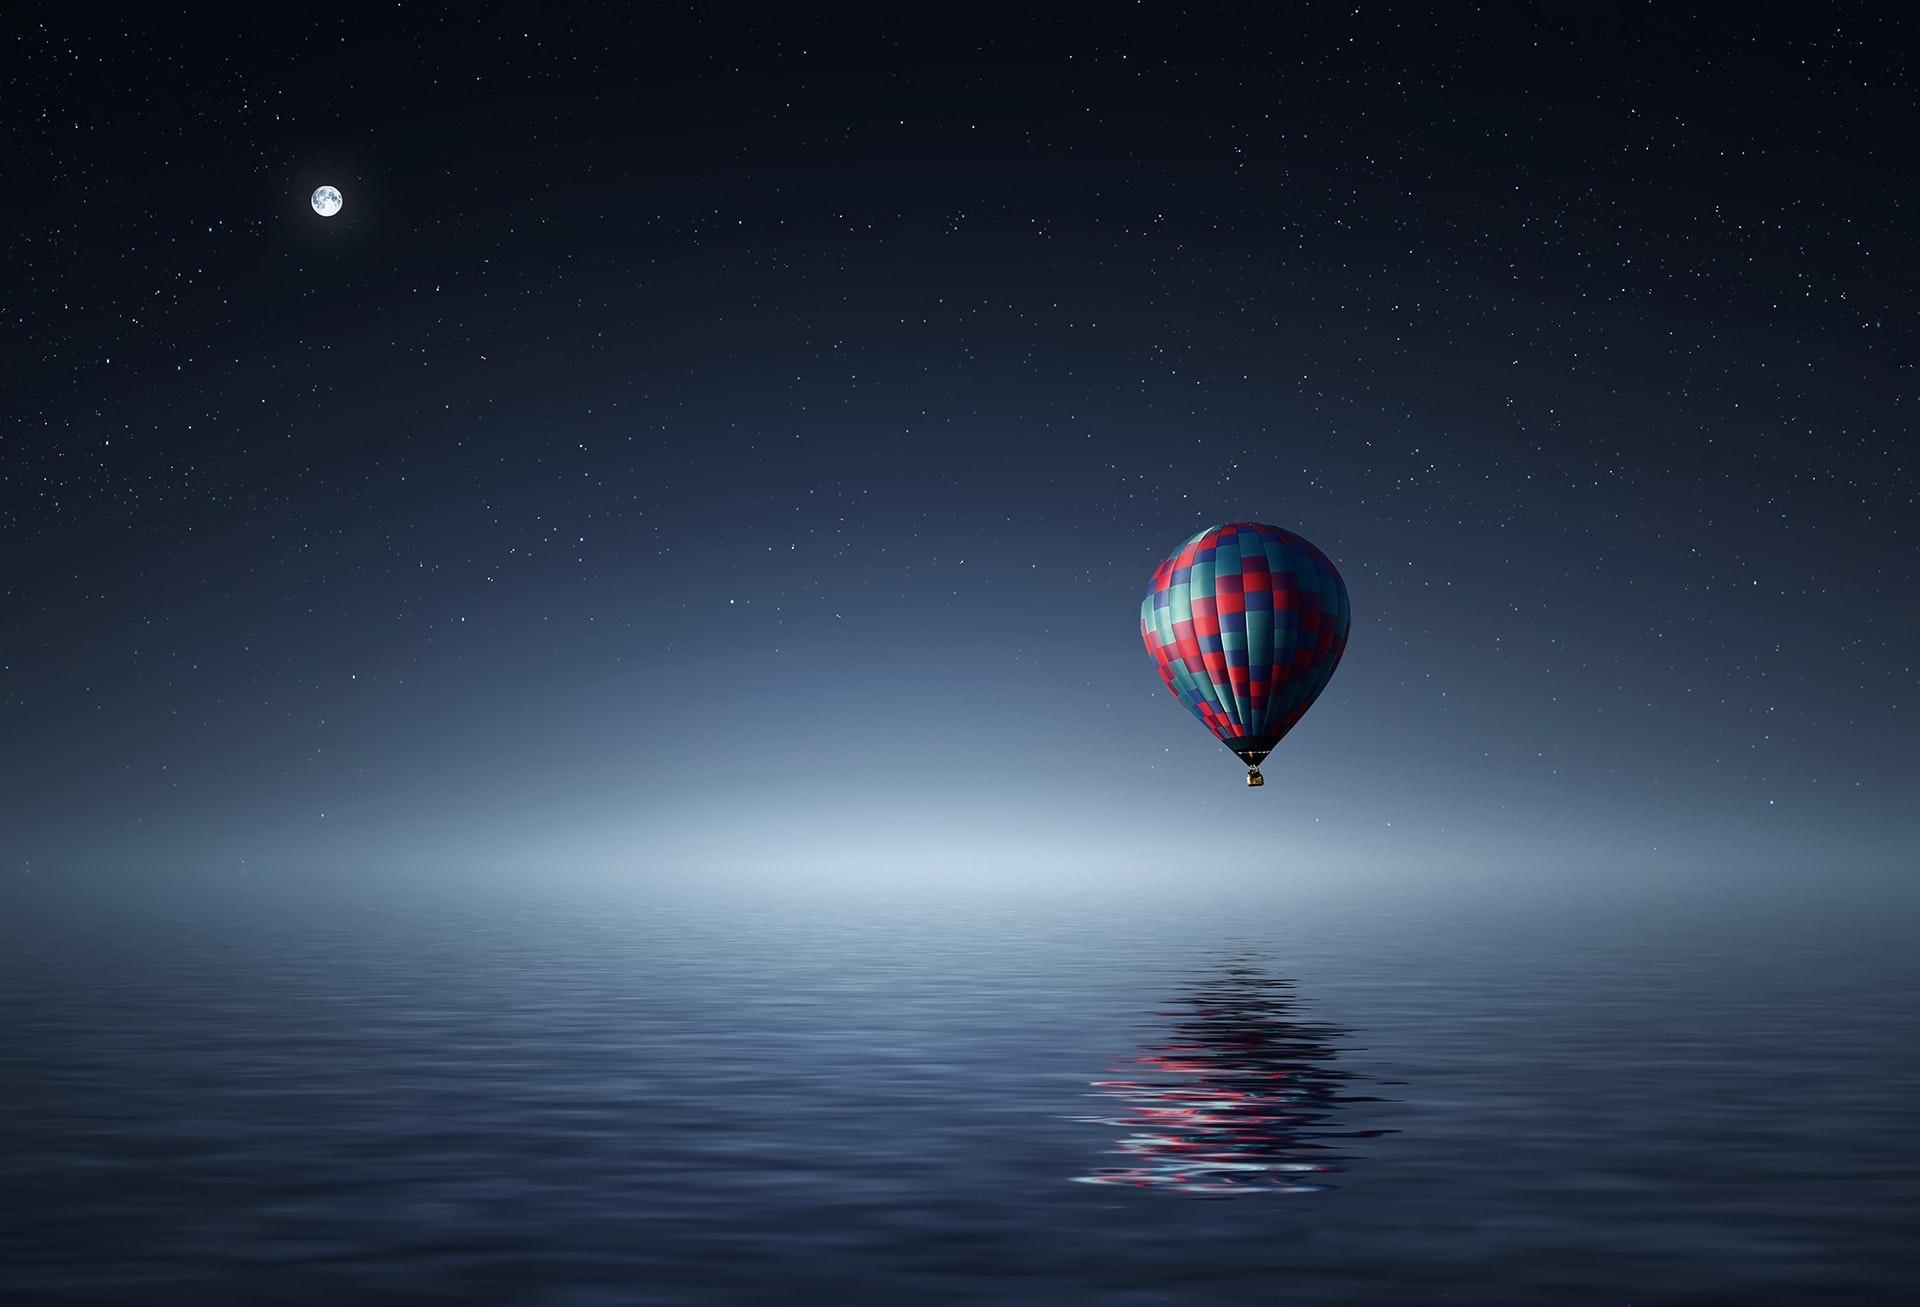 aircraft-balloon-ballooning-36487.jpg